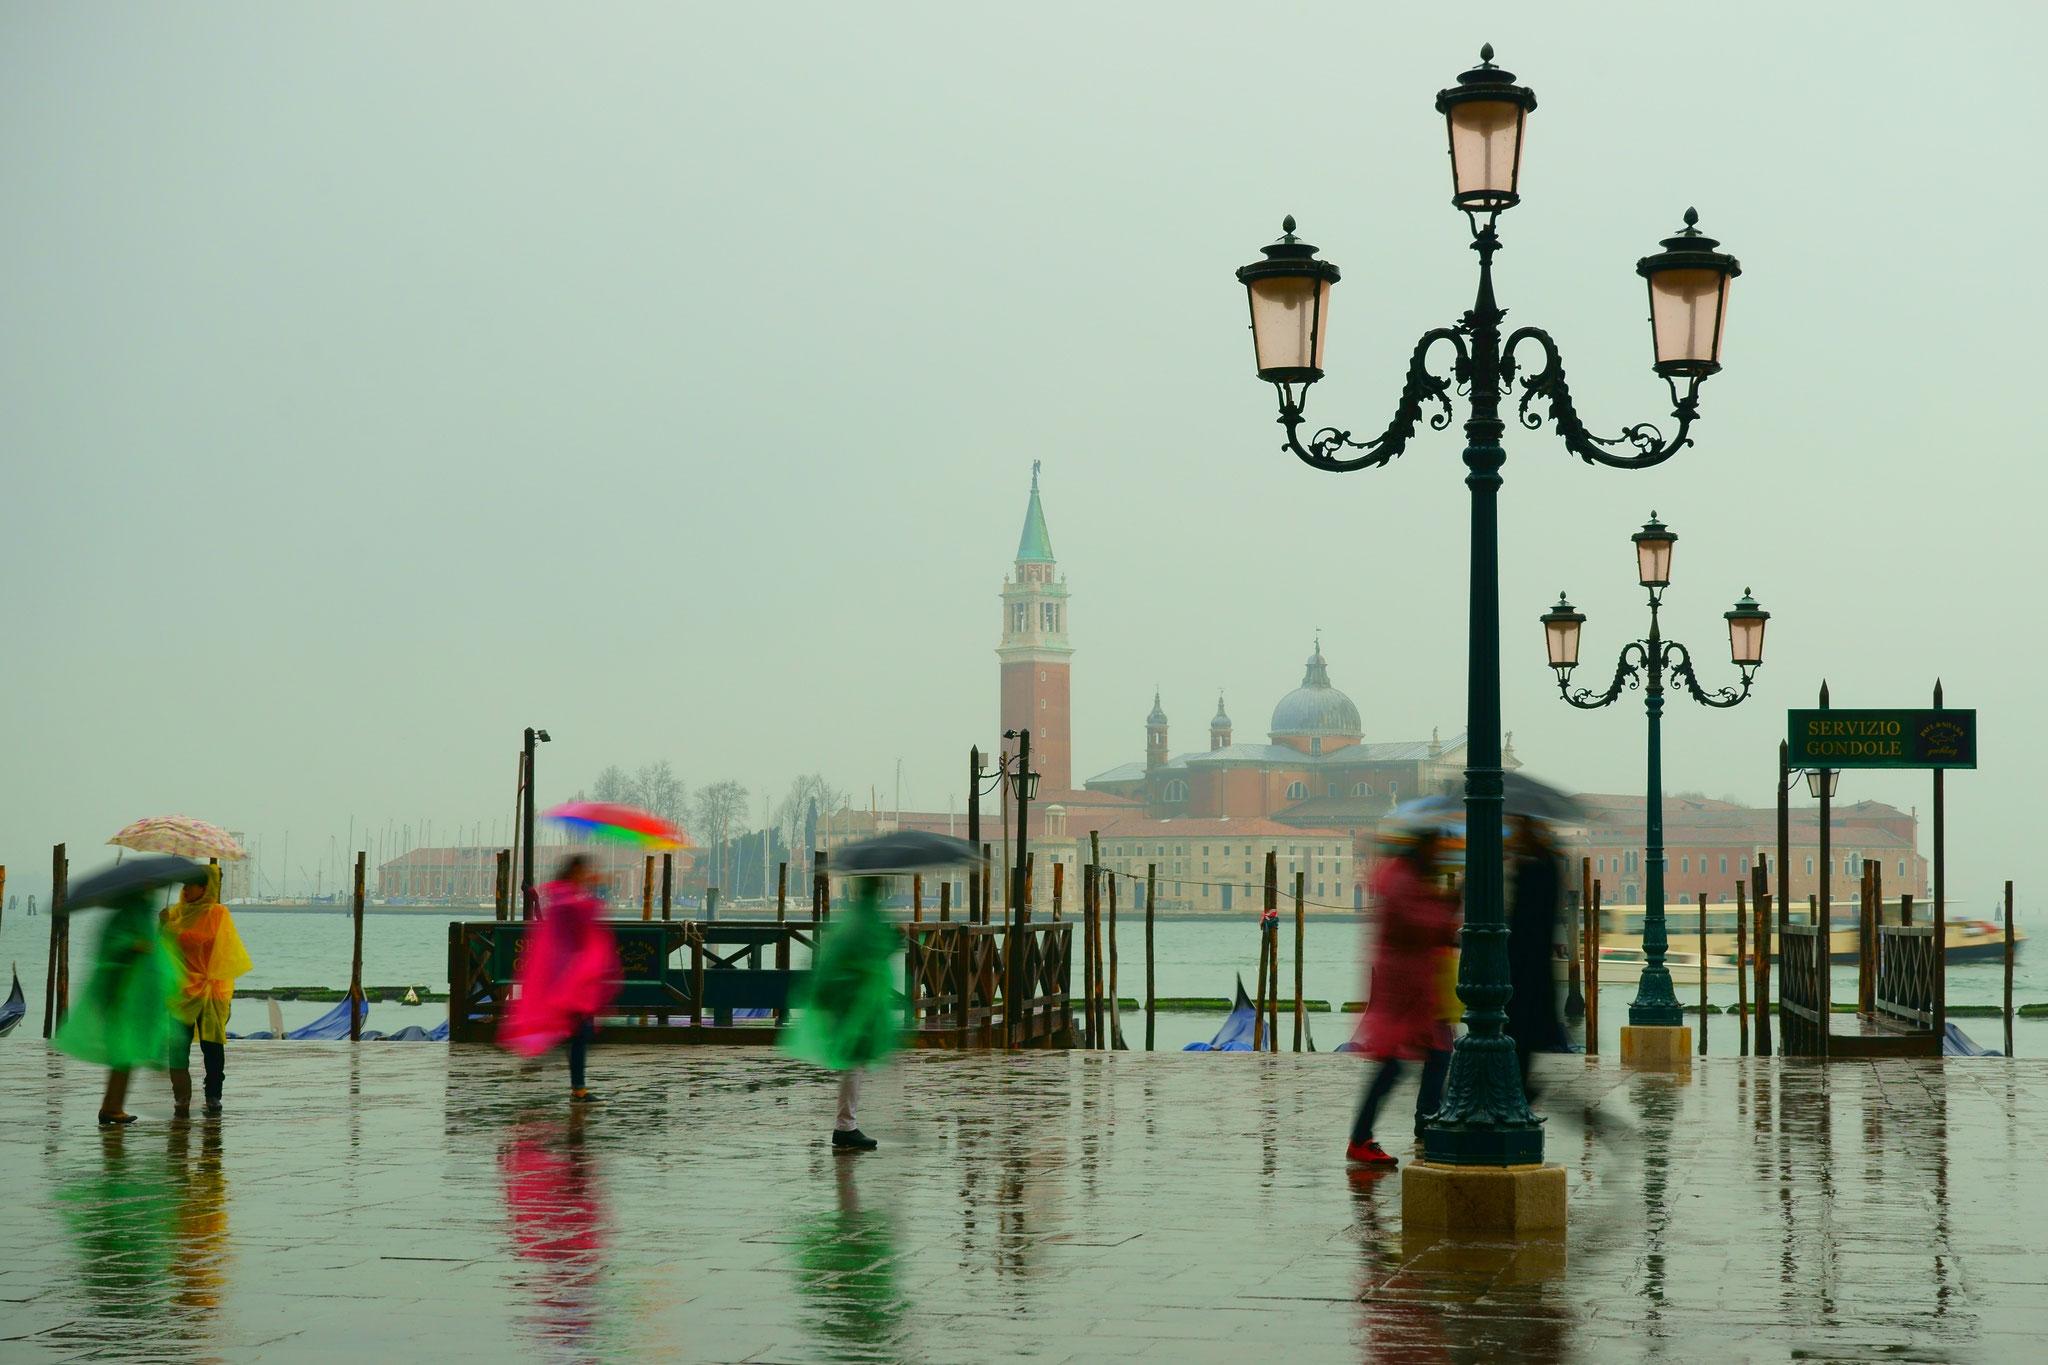 052-STAN Valentina EFIAPp (Oradea-RO) - Venice (IT)